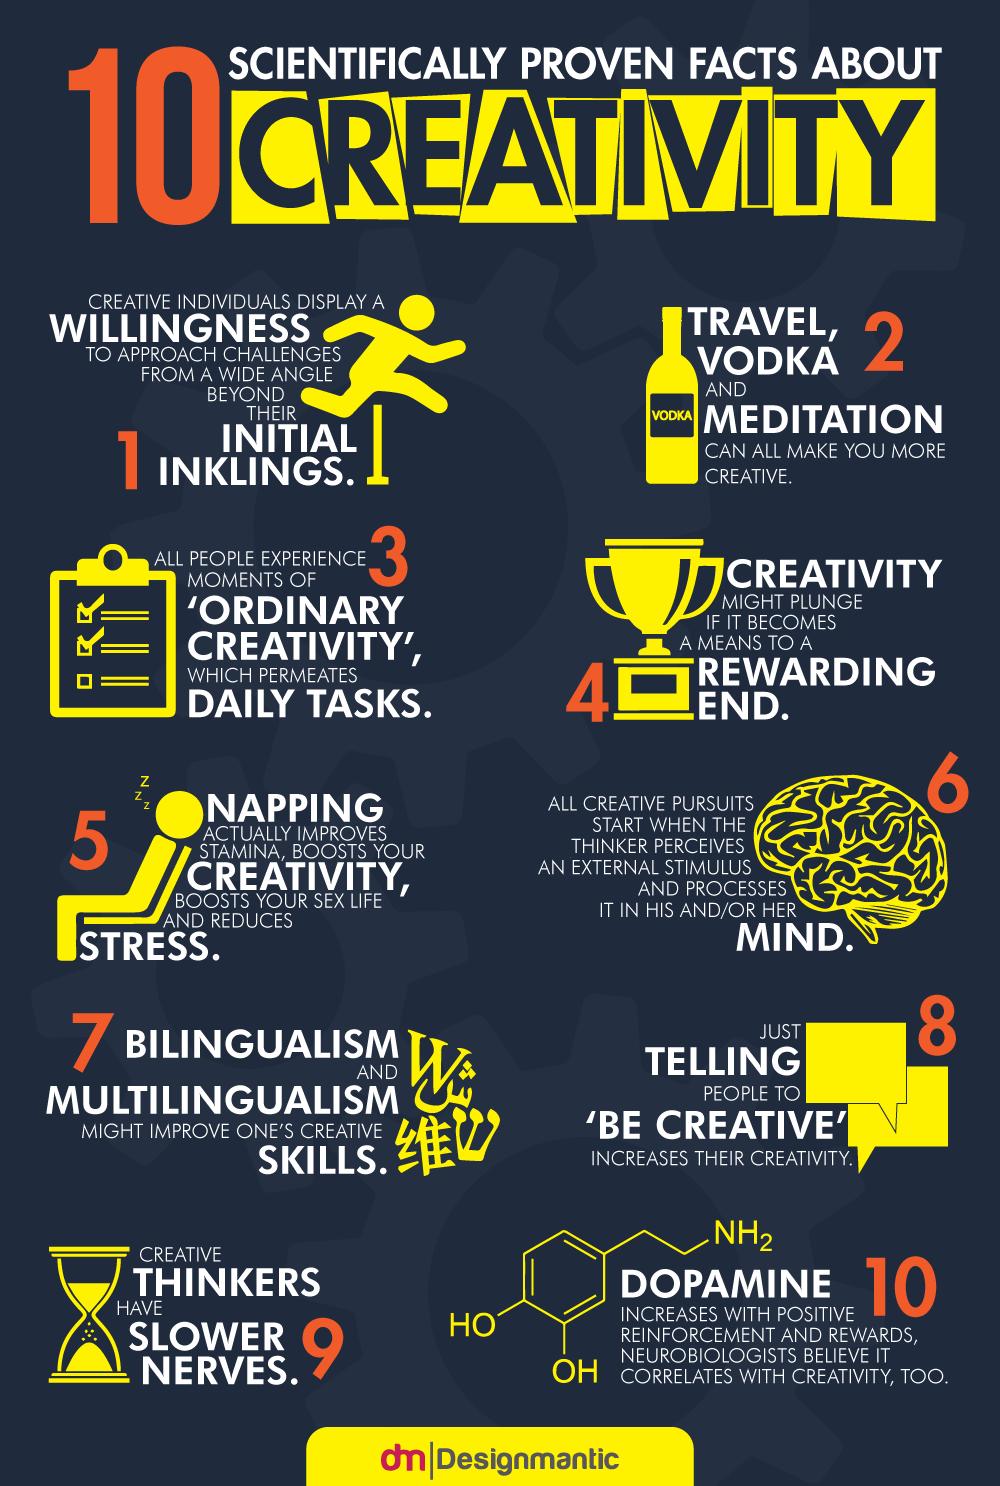 creatividad info